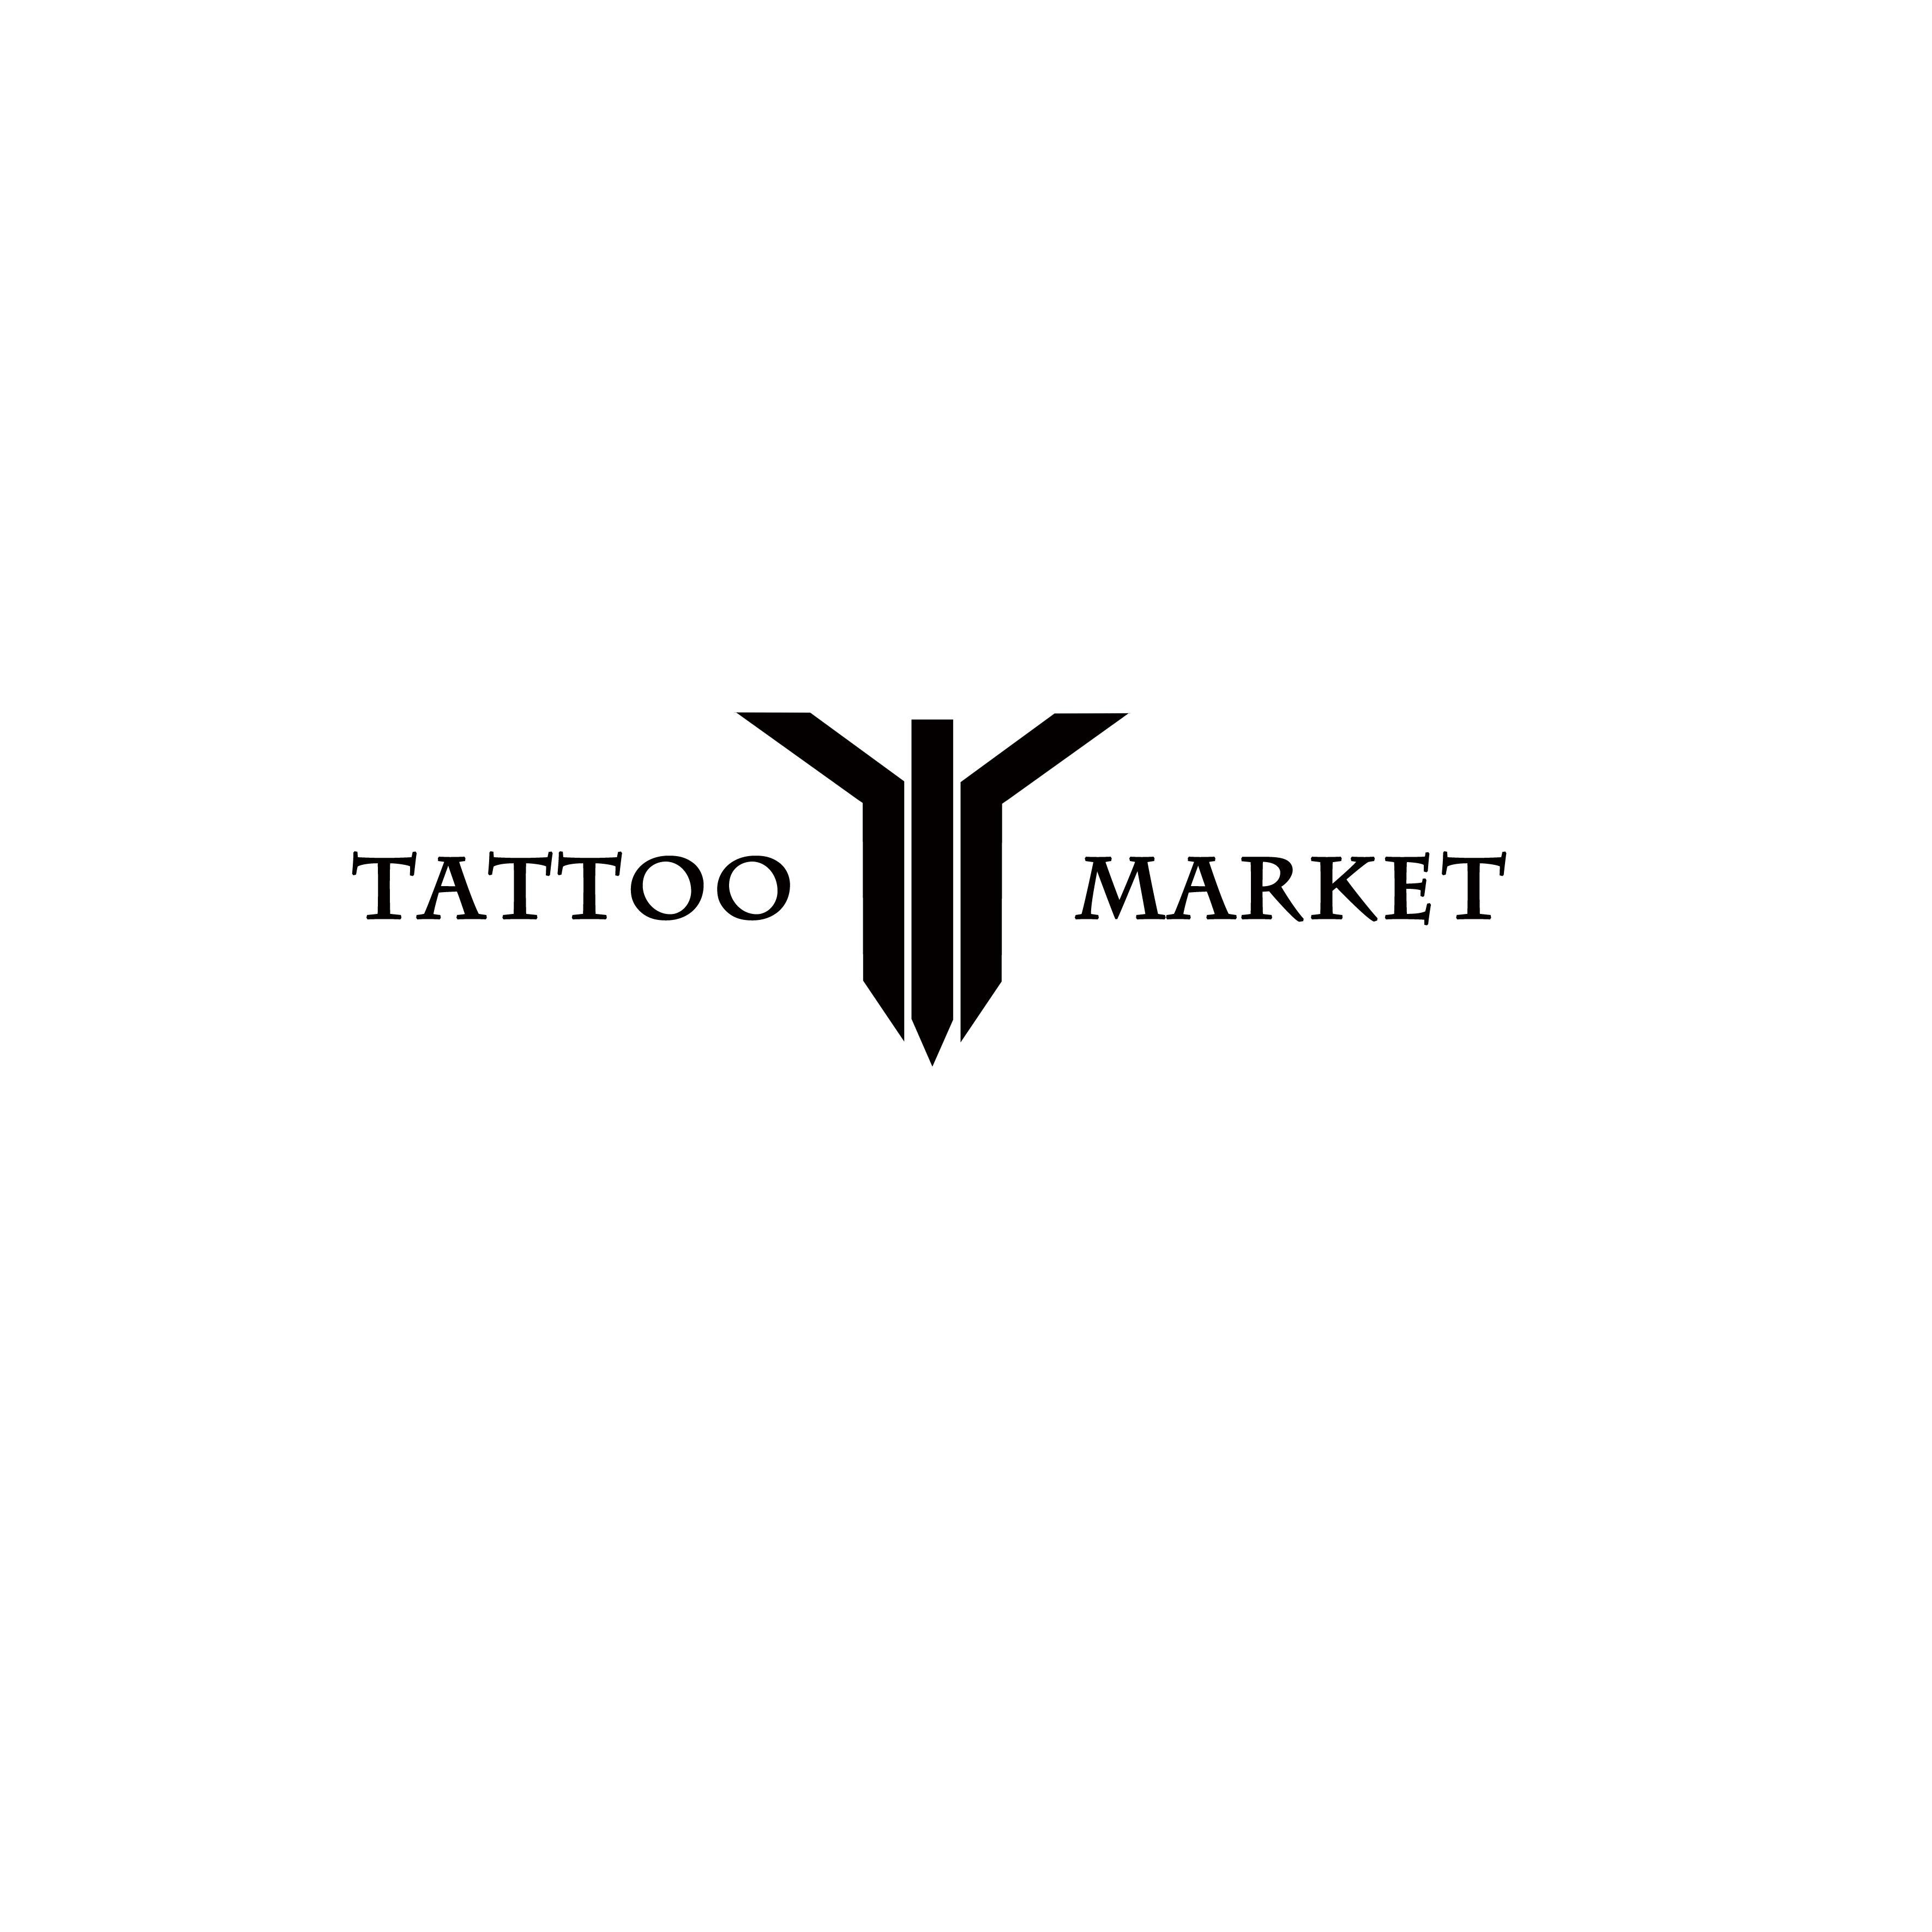 Редизайн логотипа магазина тату оборудования TattooMarket.ru фото f_8975c3a666cabbc1.jpg